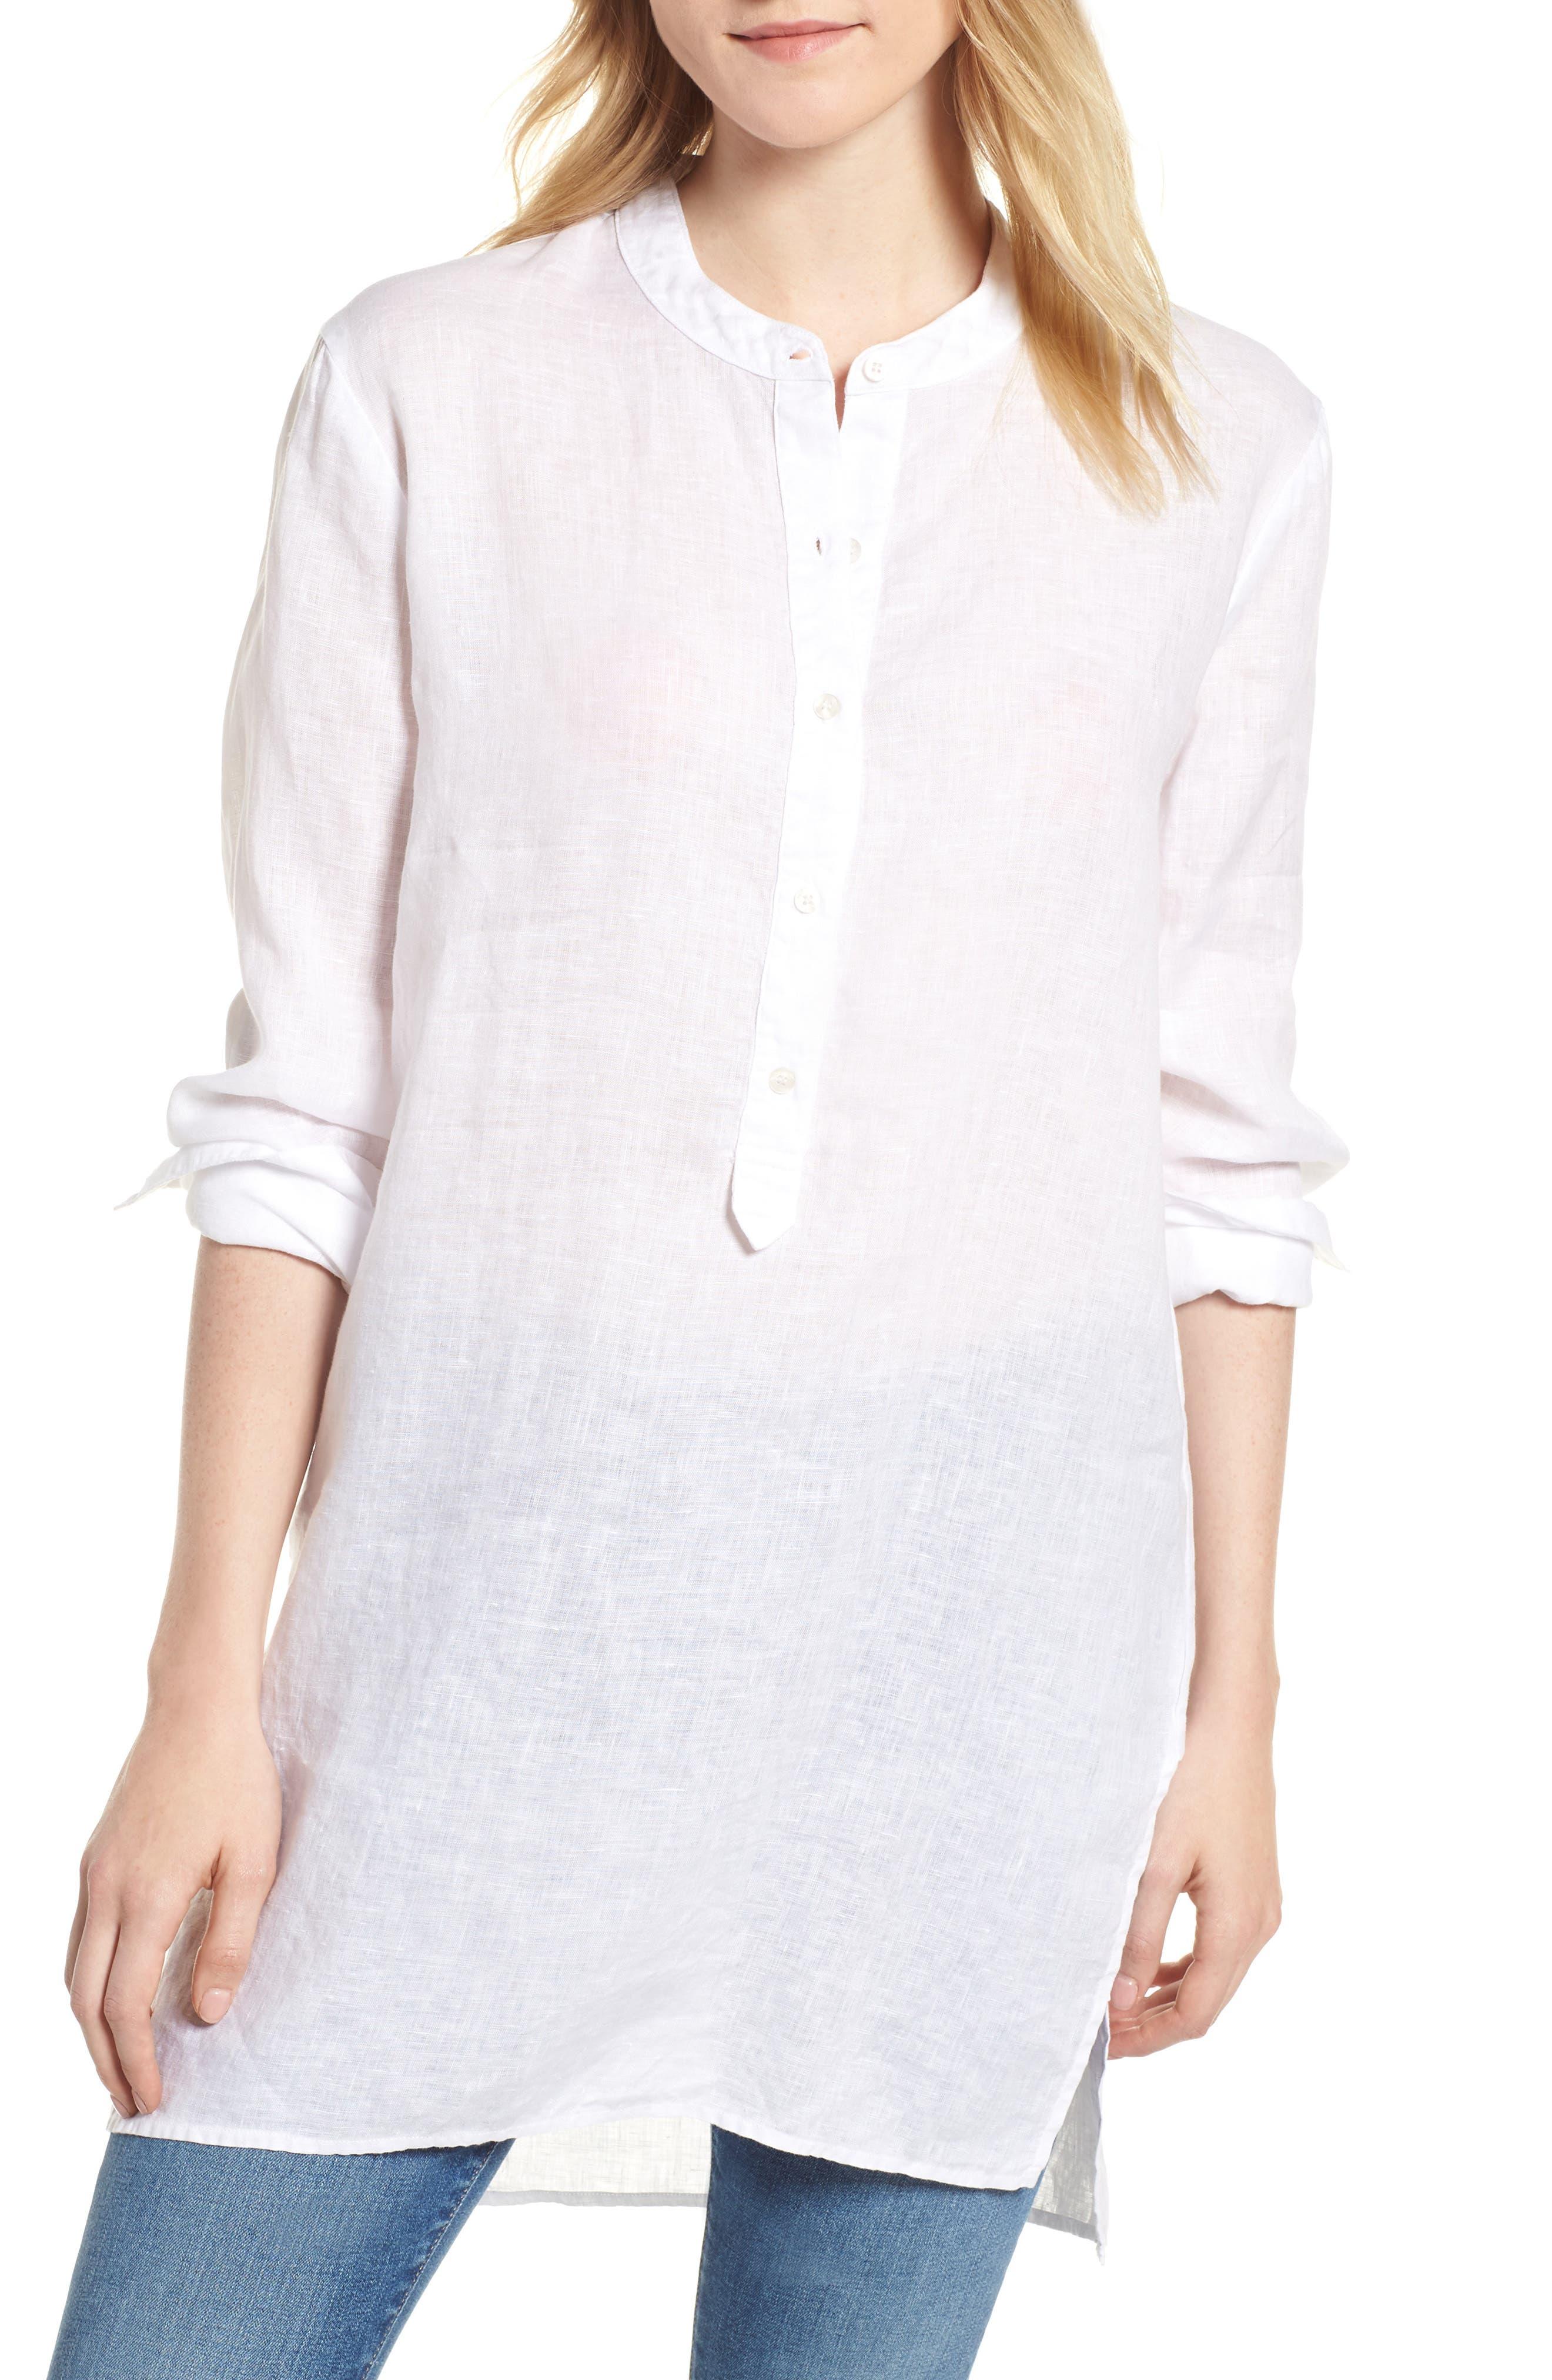 Shirting Tunic Top,                         Main,                         color, White